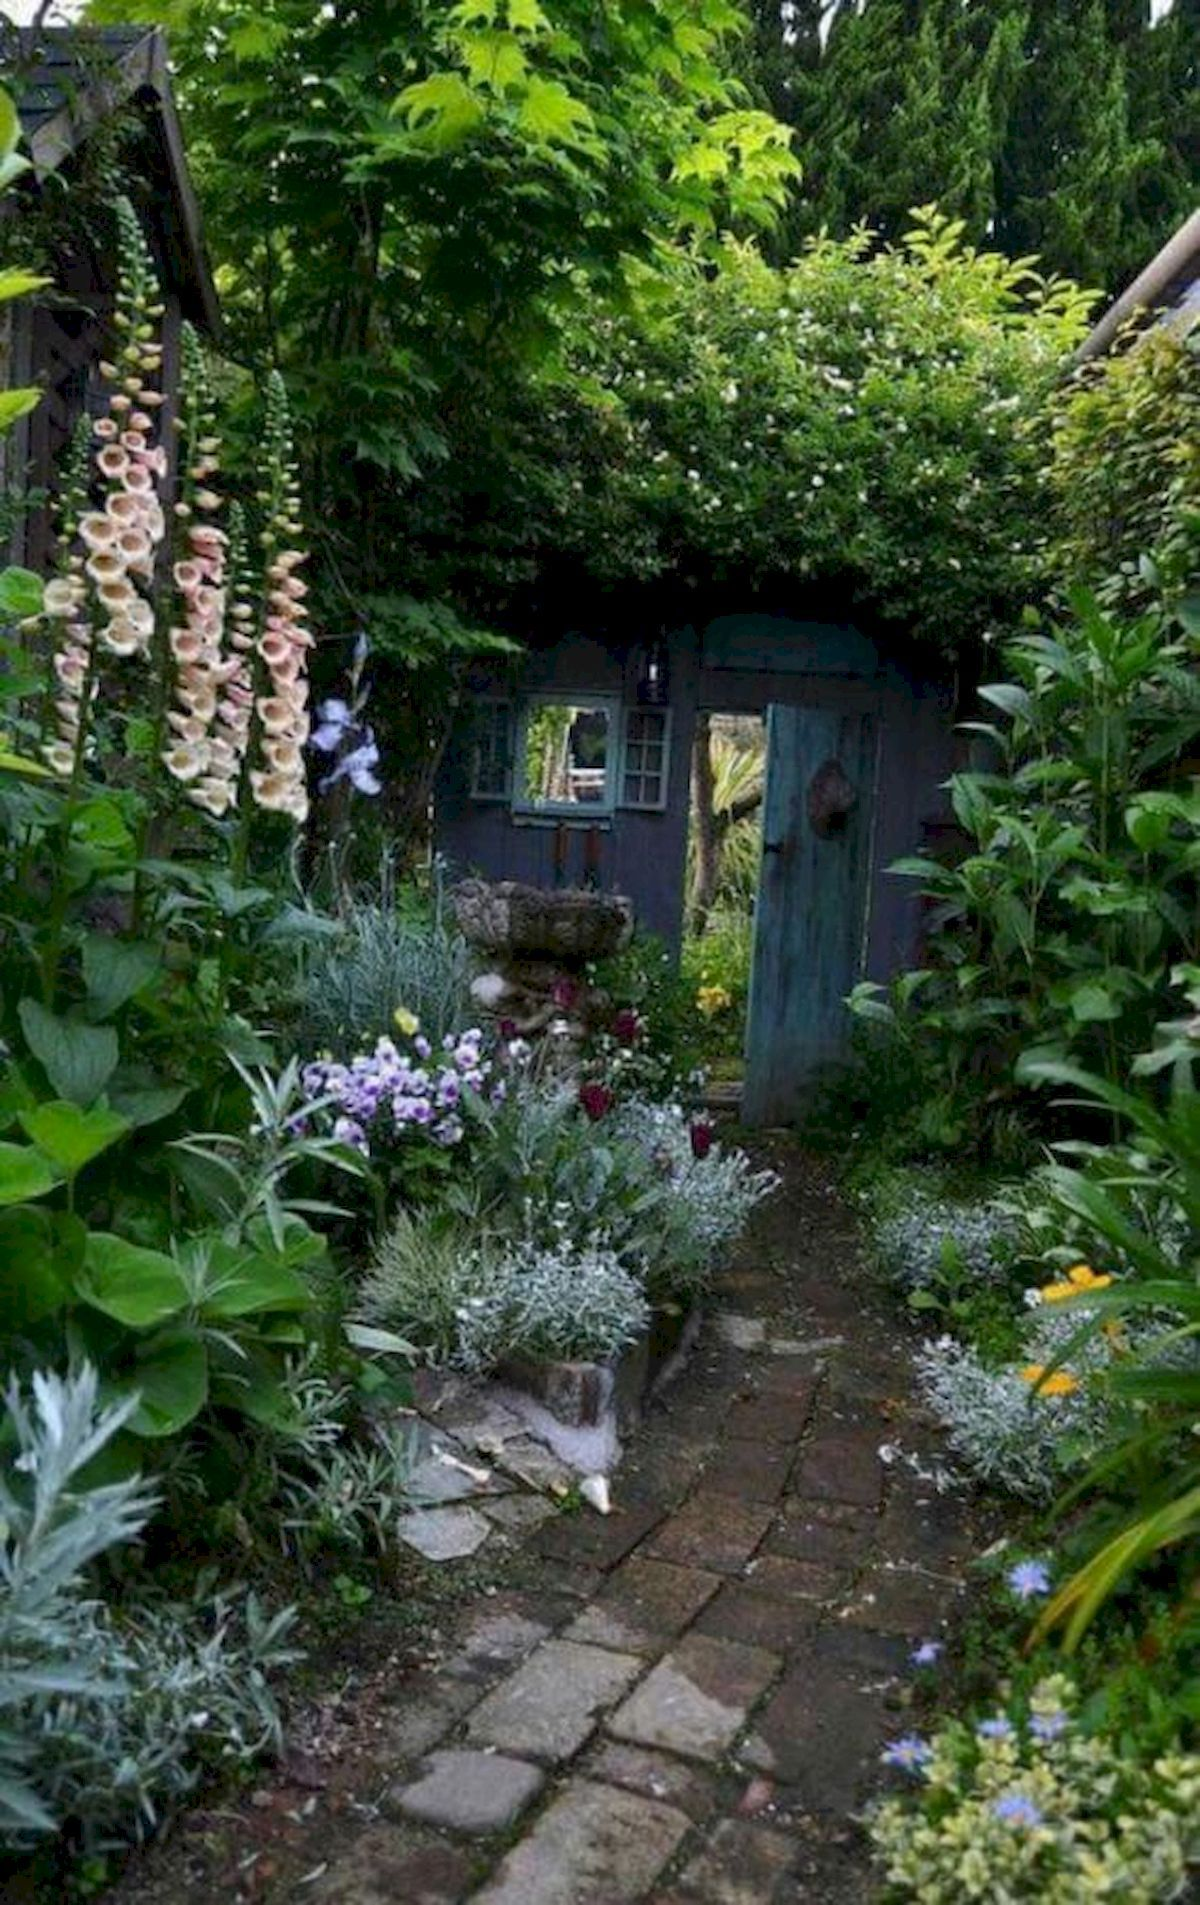 40 Amazing Secret Garden Design Ideas For Summer Worldecor Co Small Cottage Garden Ideas Cottage Garden Cottage Garden Design Backyard garden garden design ideas